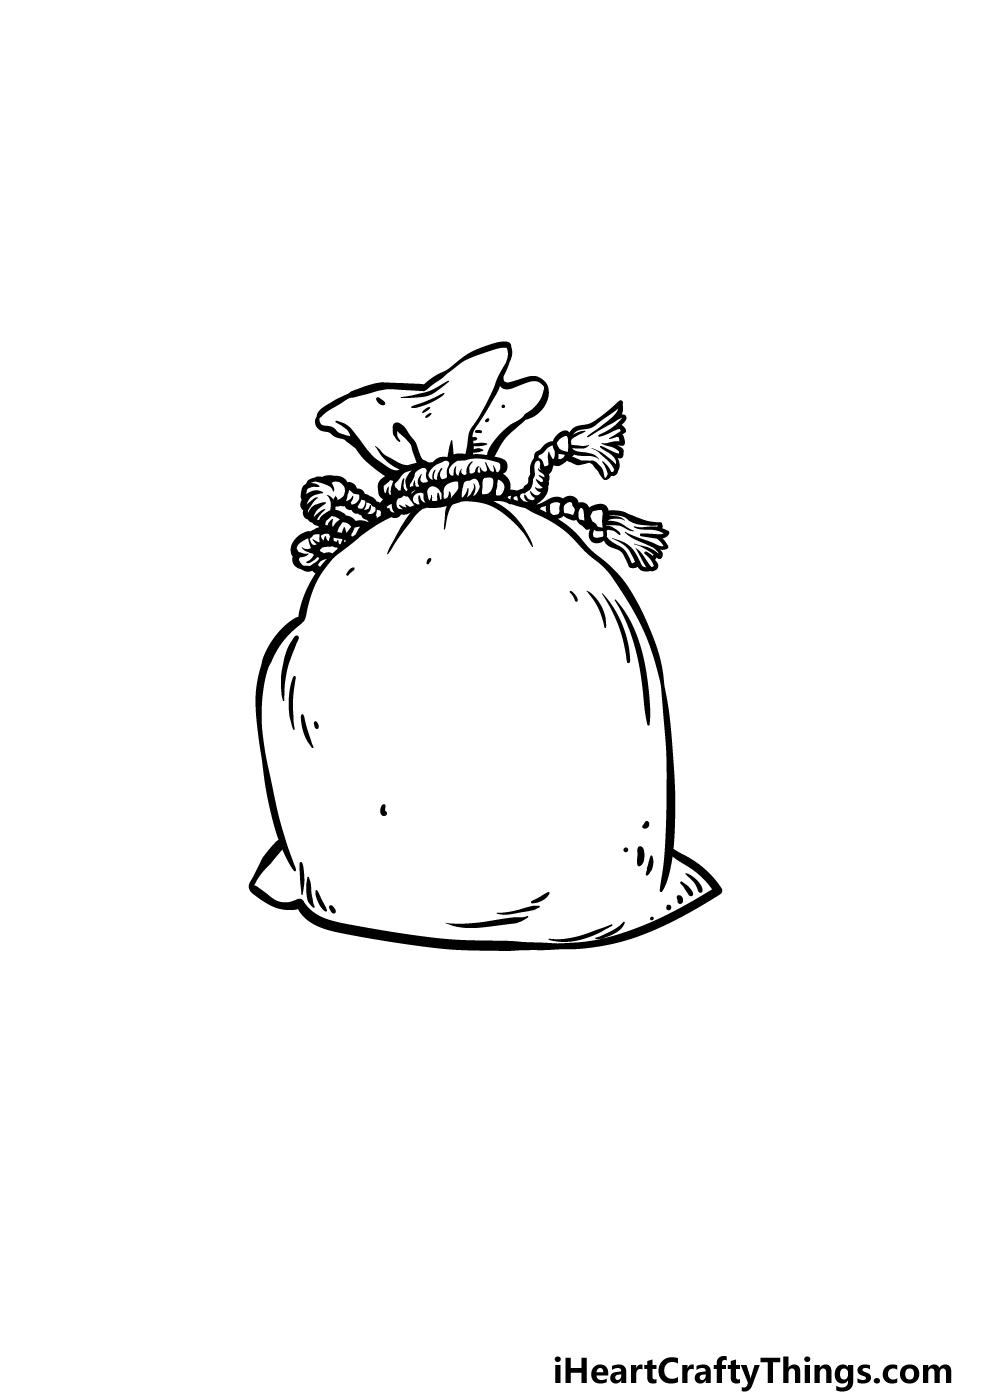 drawing a money bag step 4